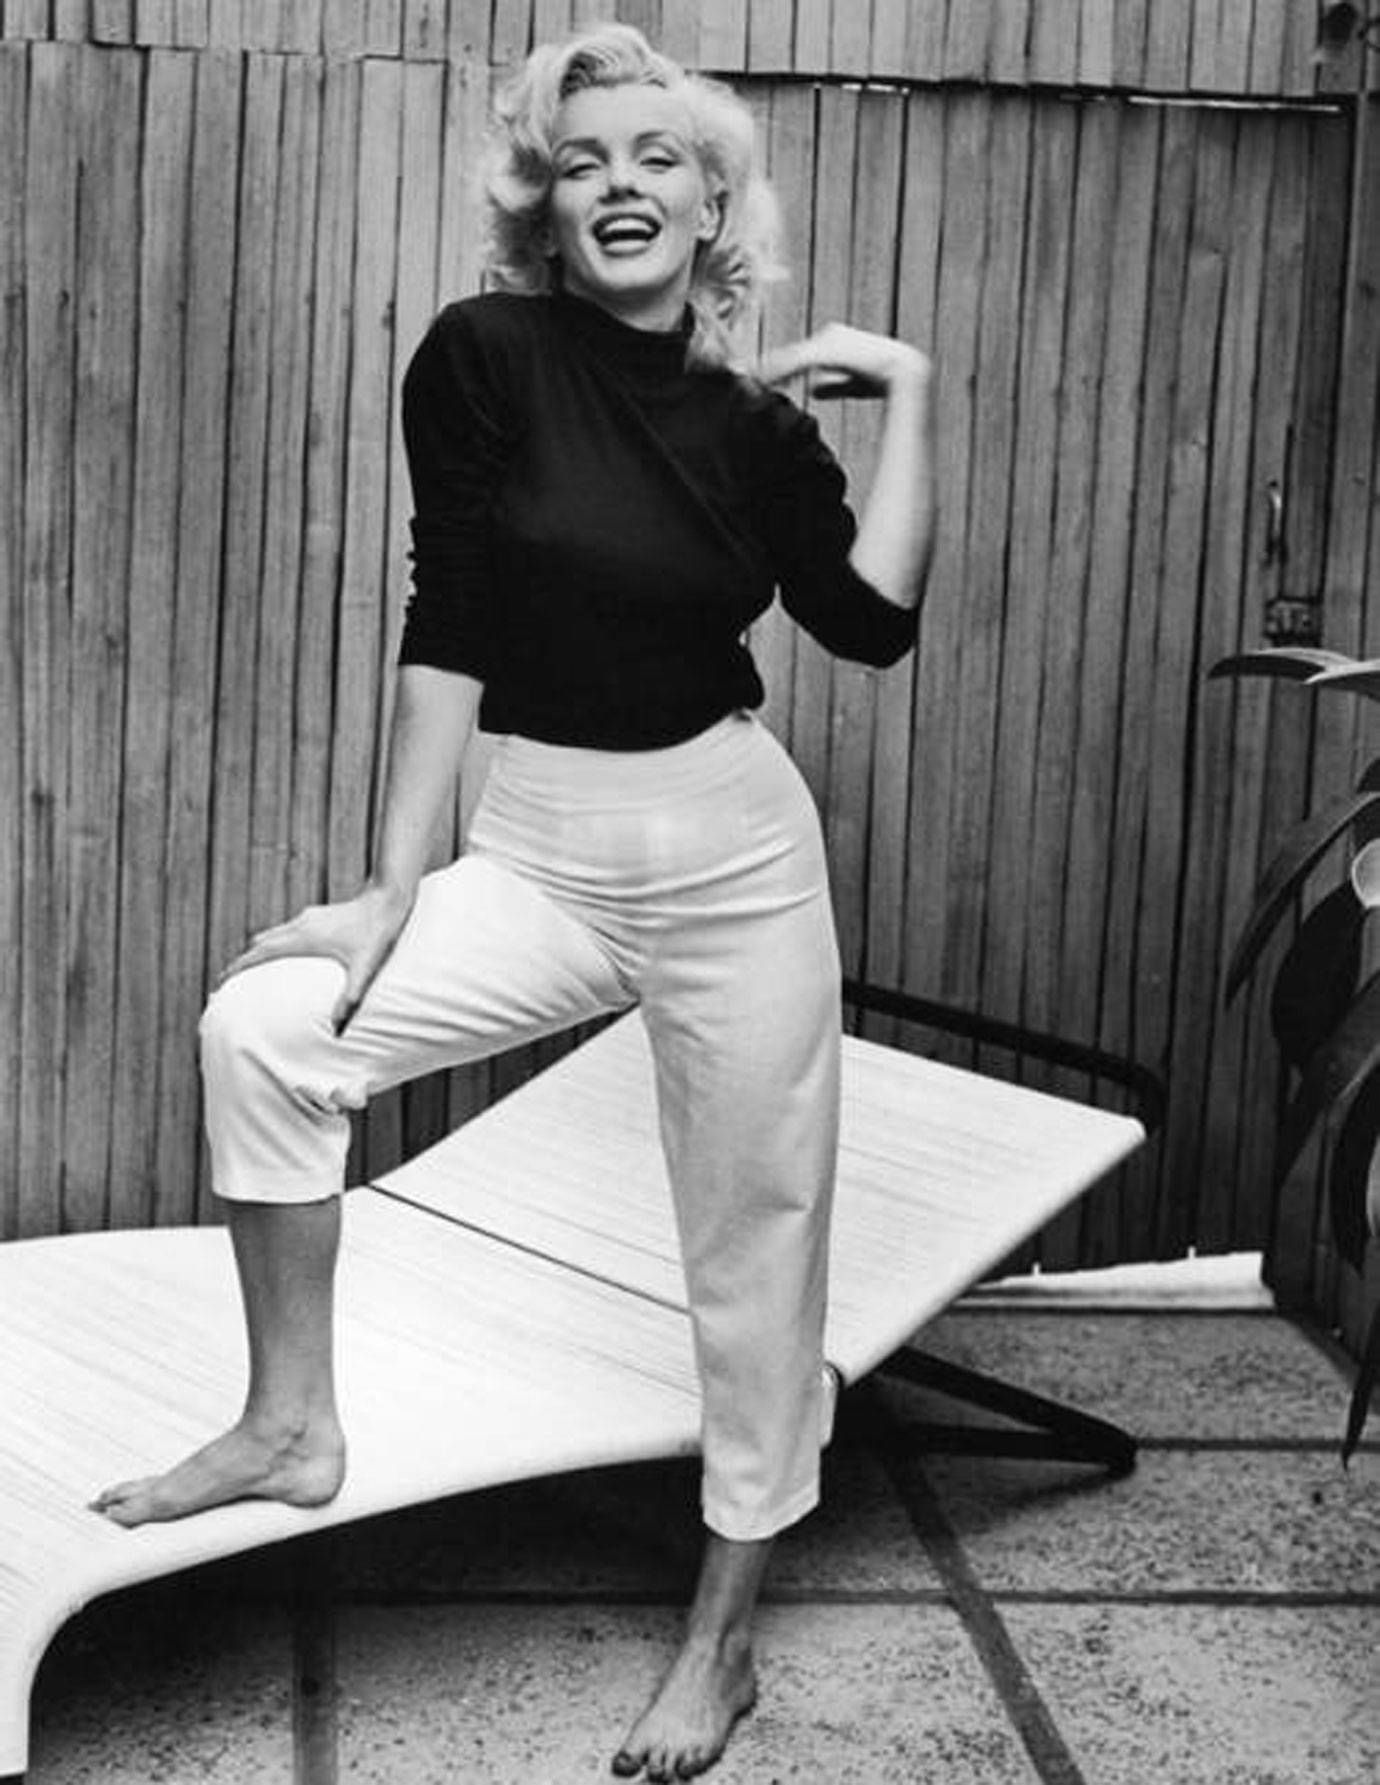 0d778eaeaa1e65 Być jak Marilyn Monroe - old fashioned analiza stylu - Old Fashoined Girl